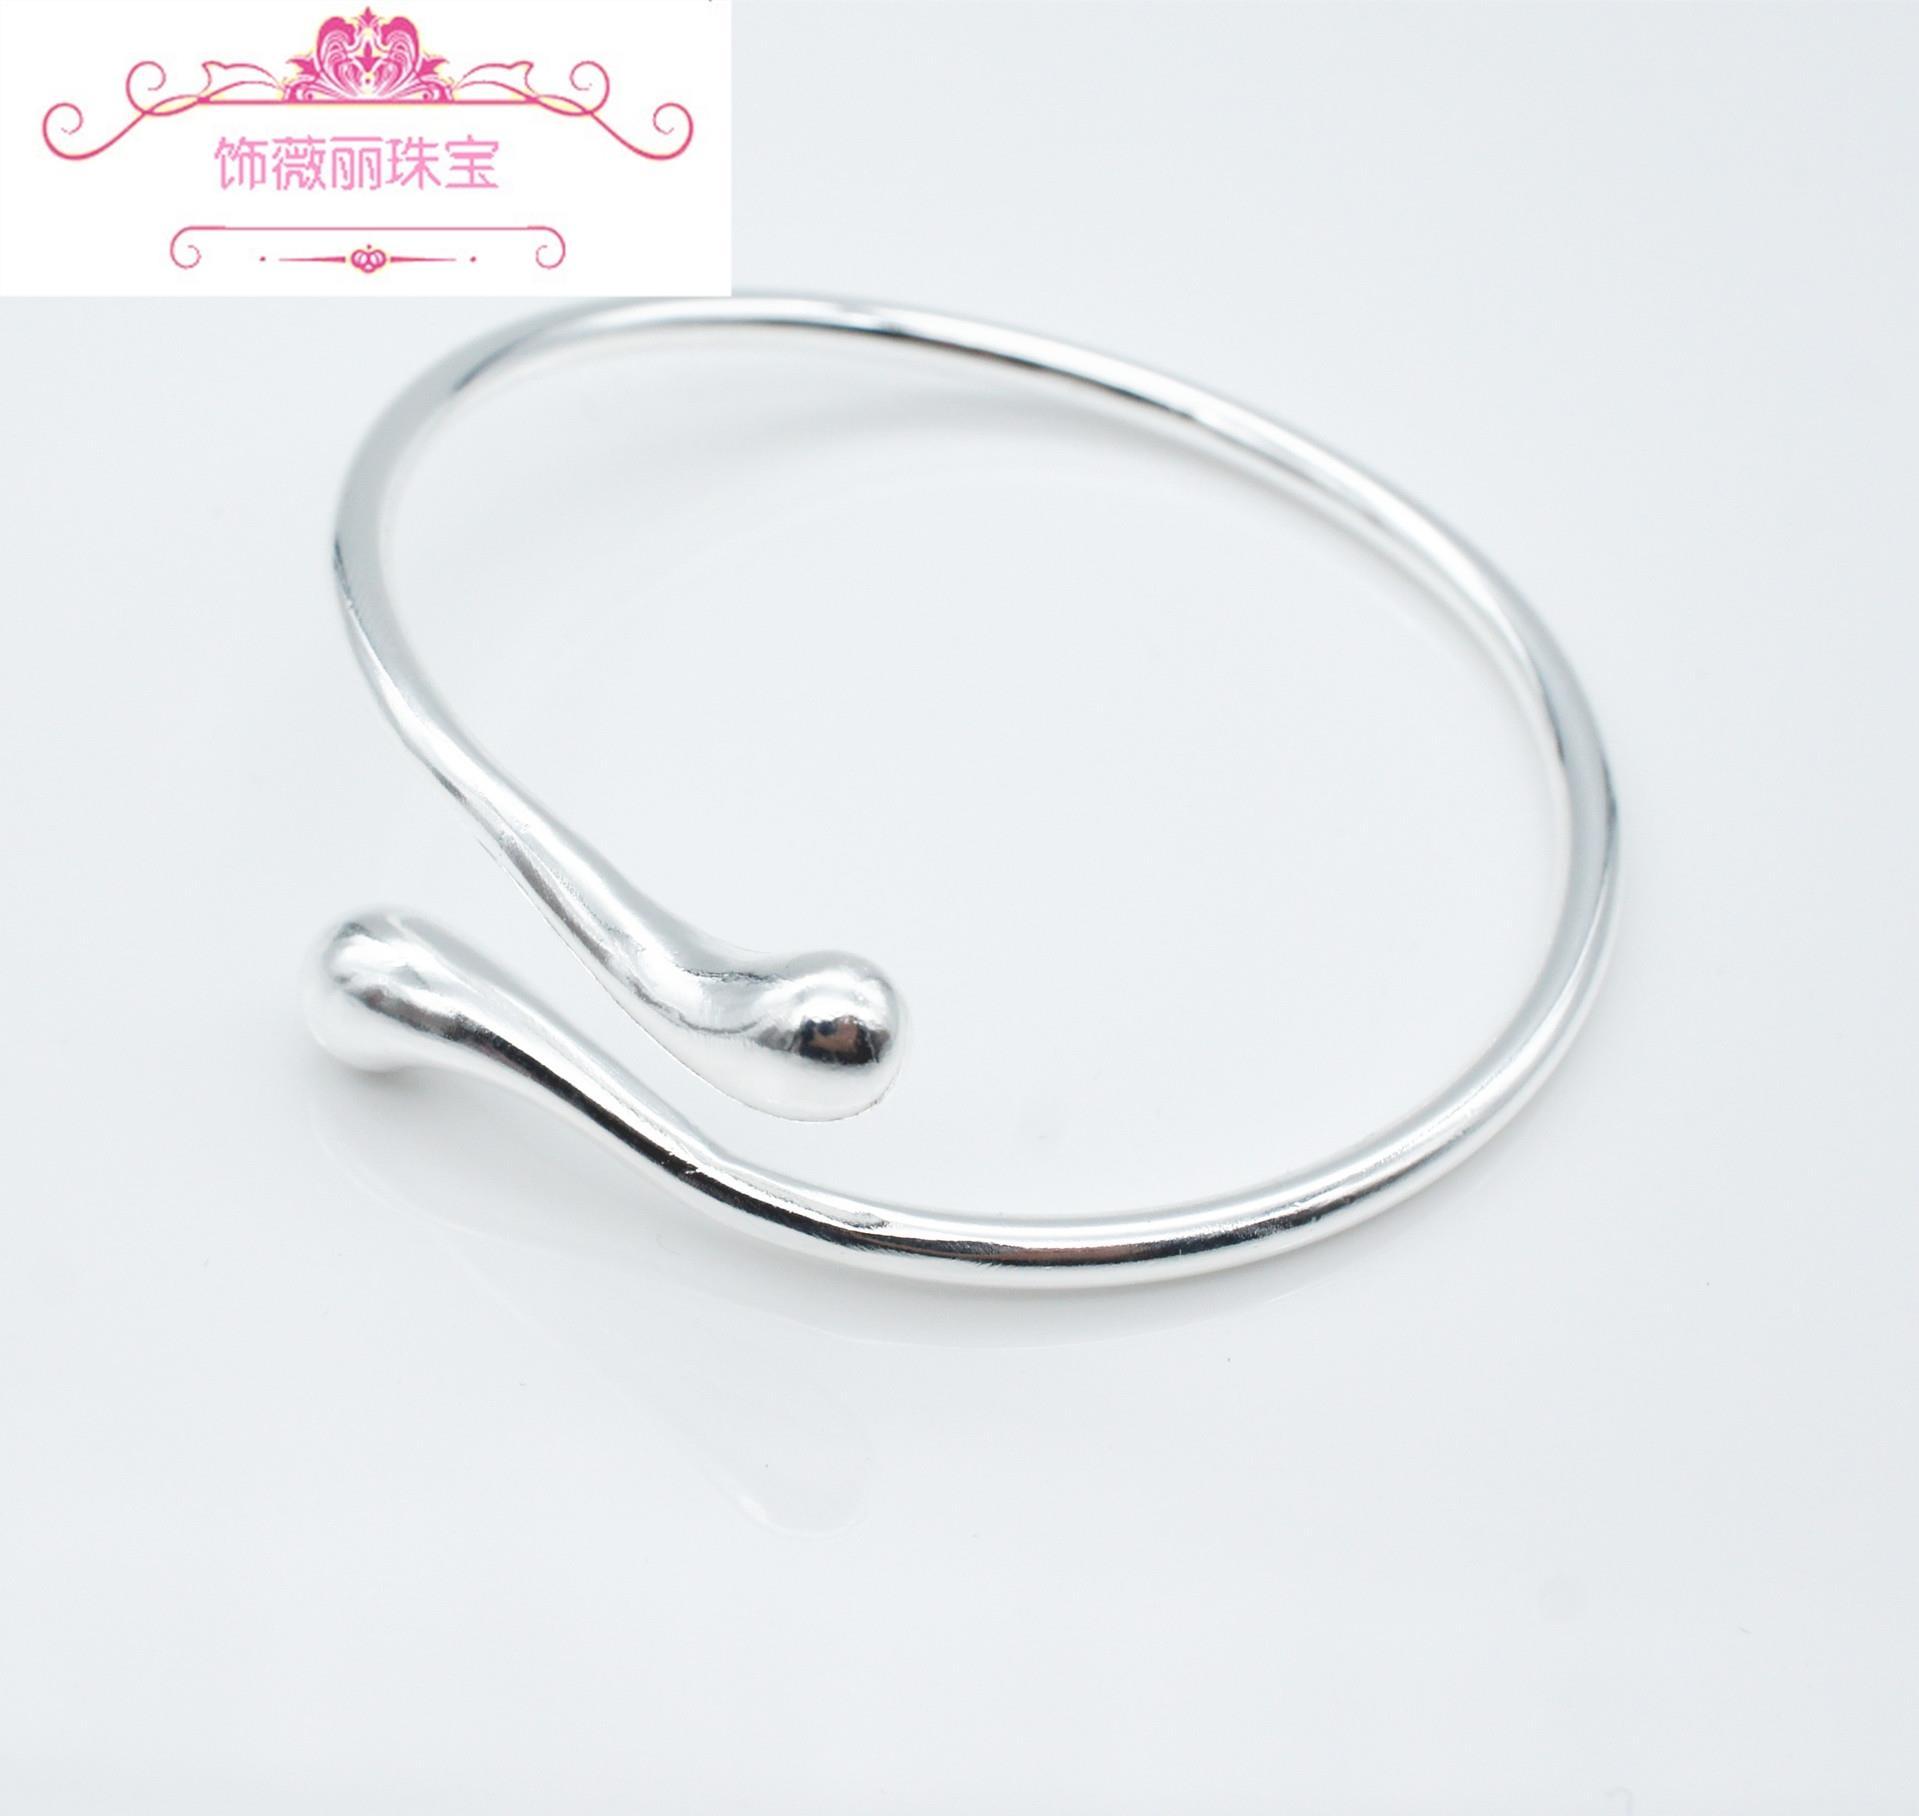 ebay镀银wish个性时尚铜镀引流耳钩店铺造型耳饰水滴欧美热卖款